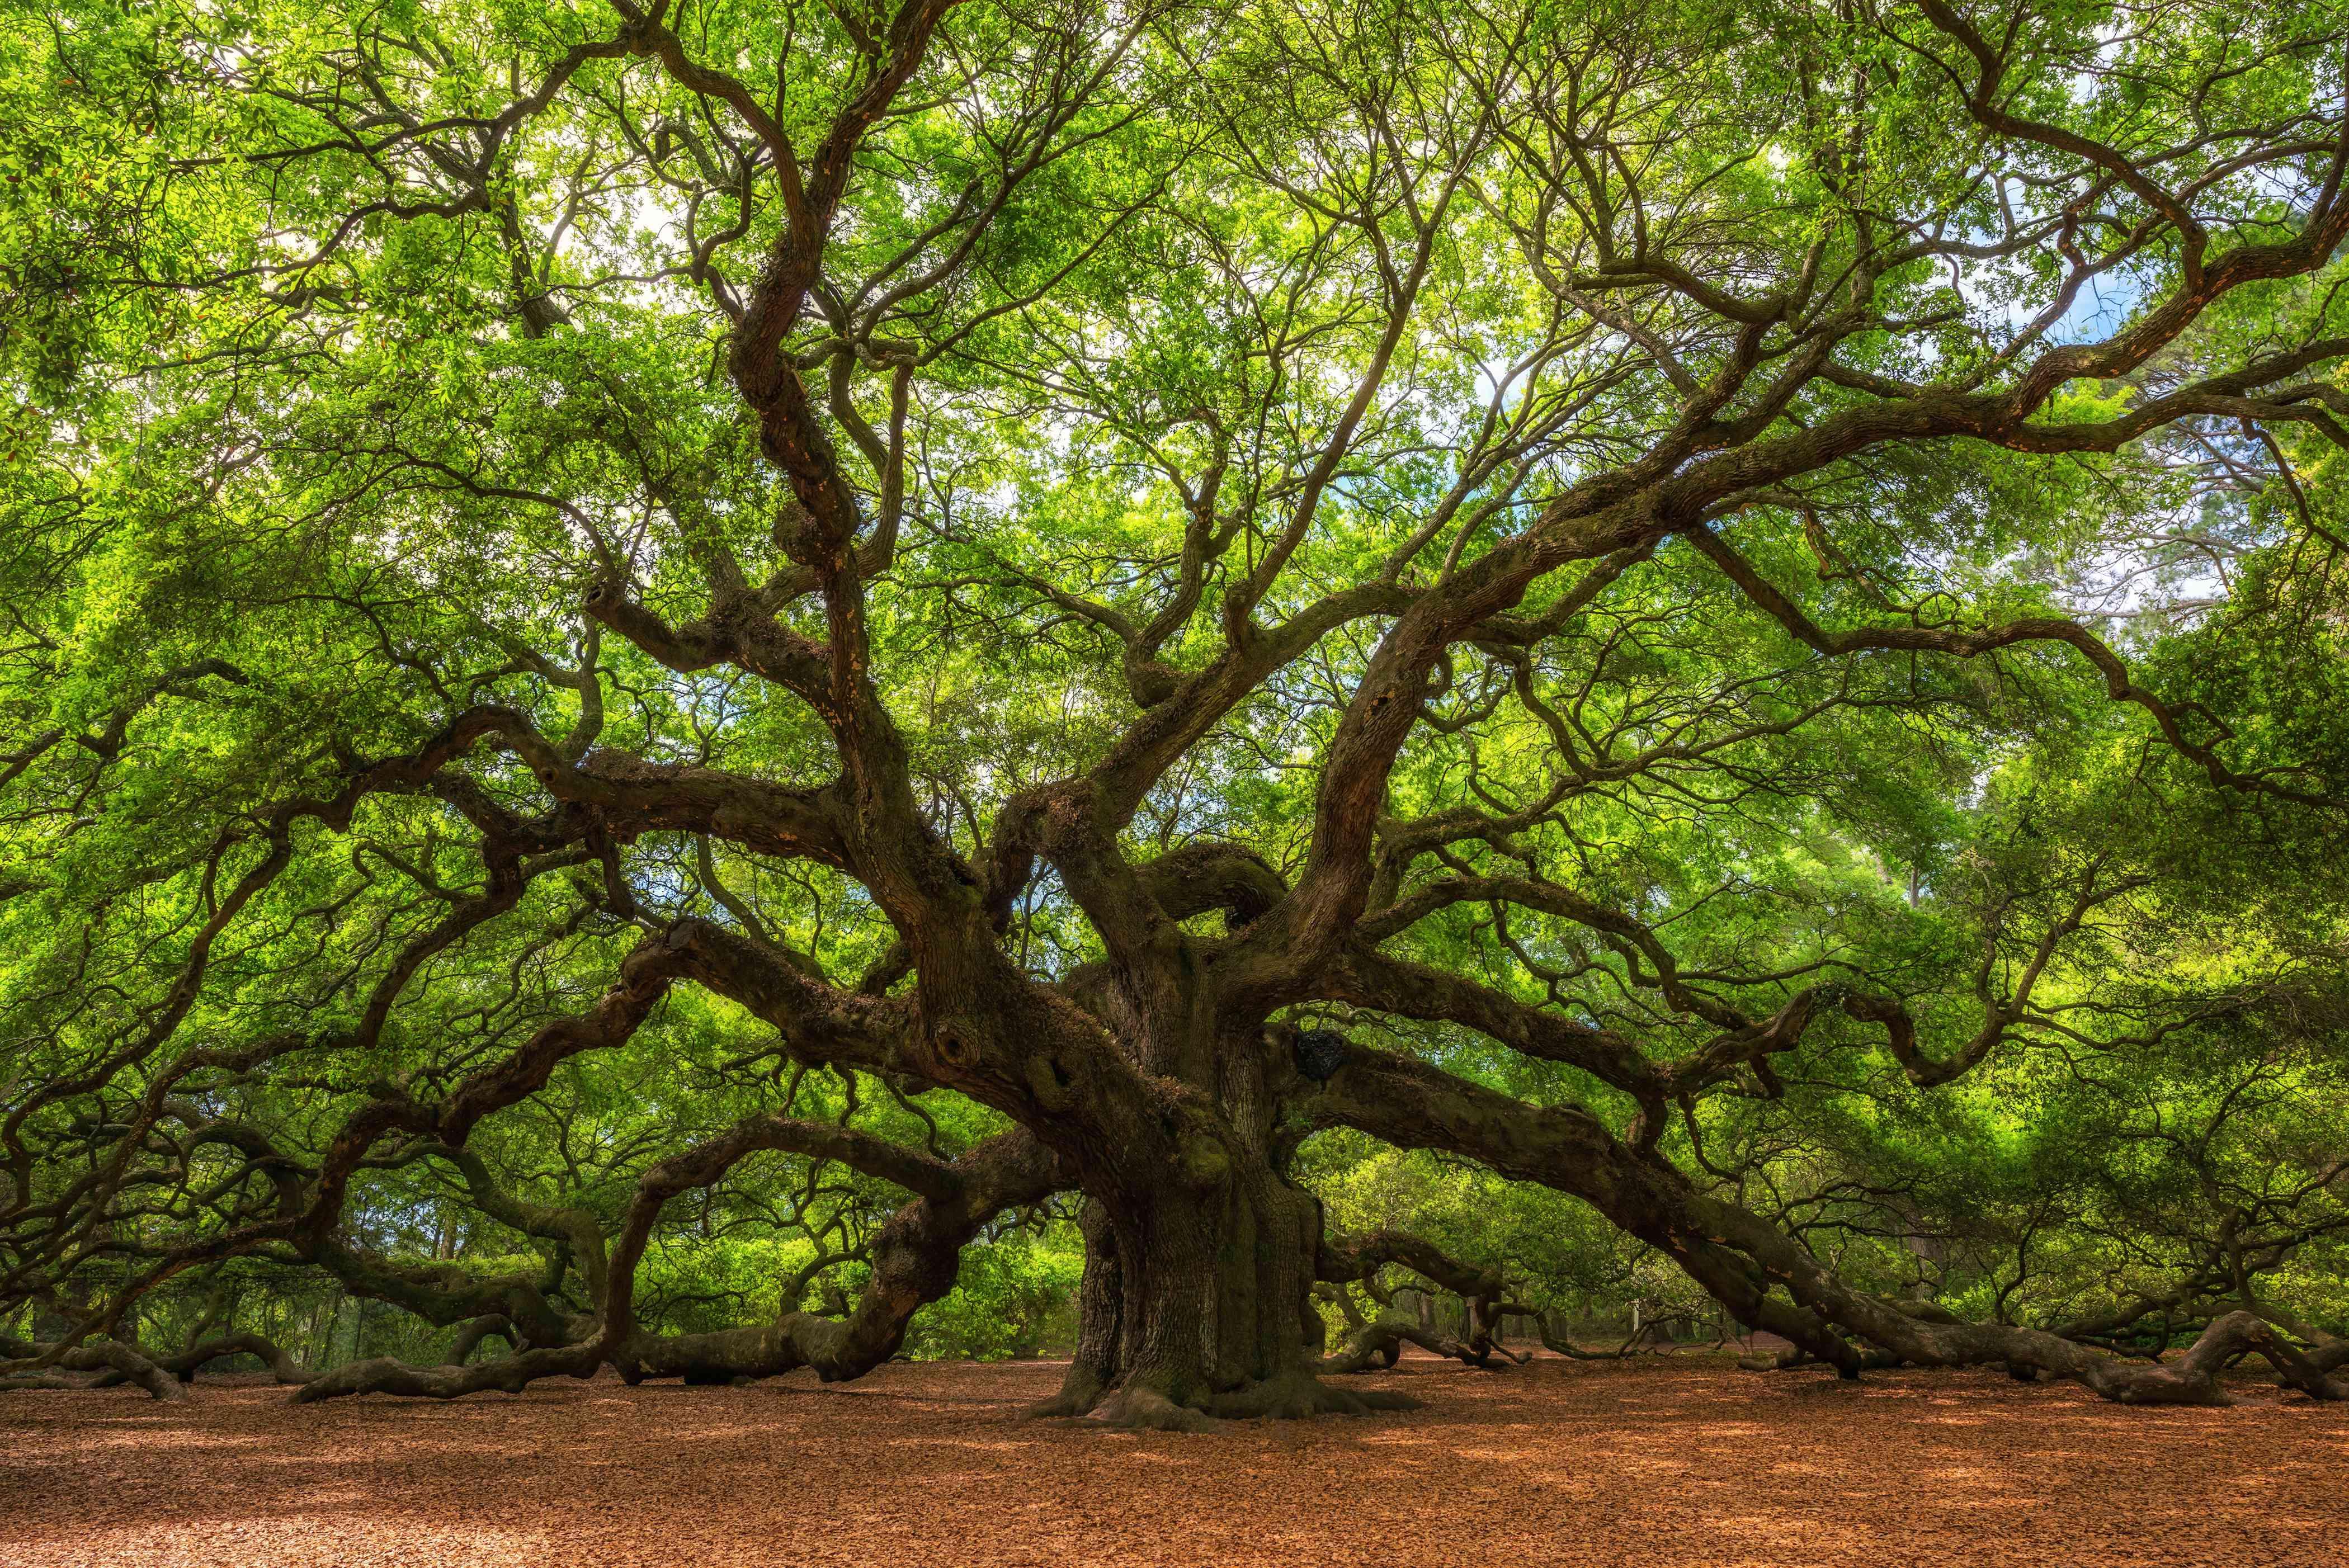 Angel Oak tree on Johns Island, S.C.